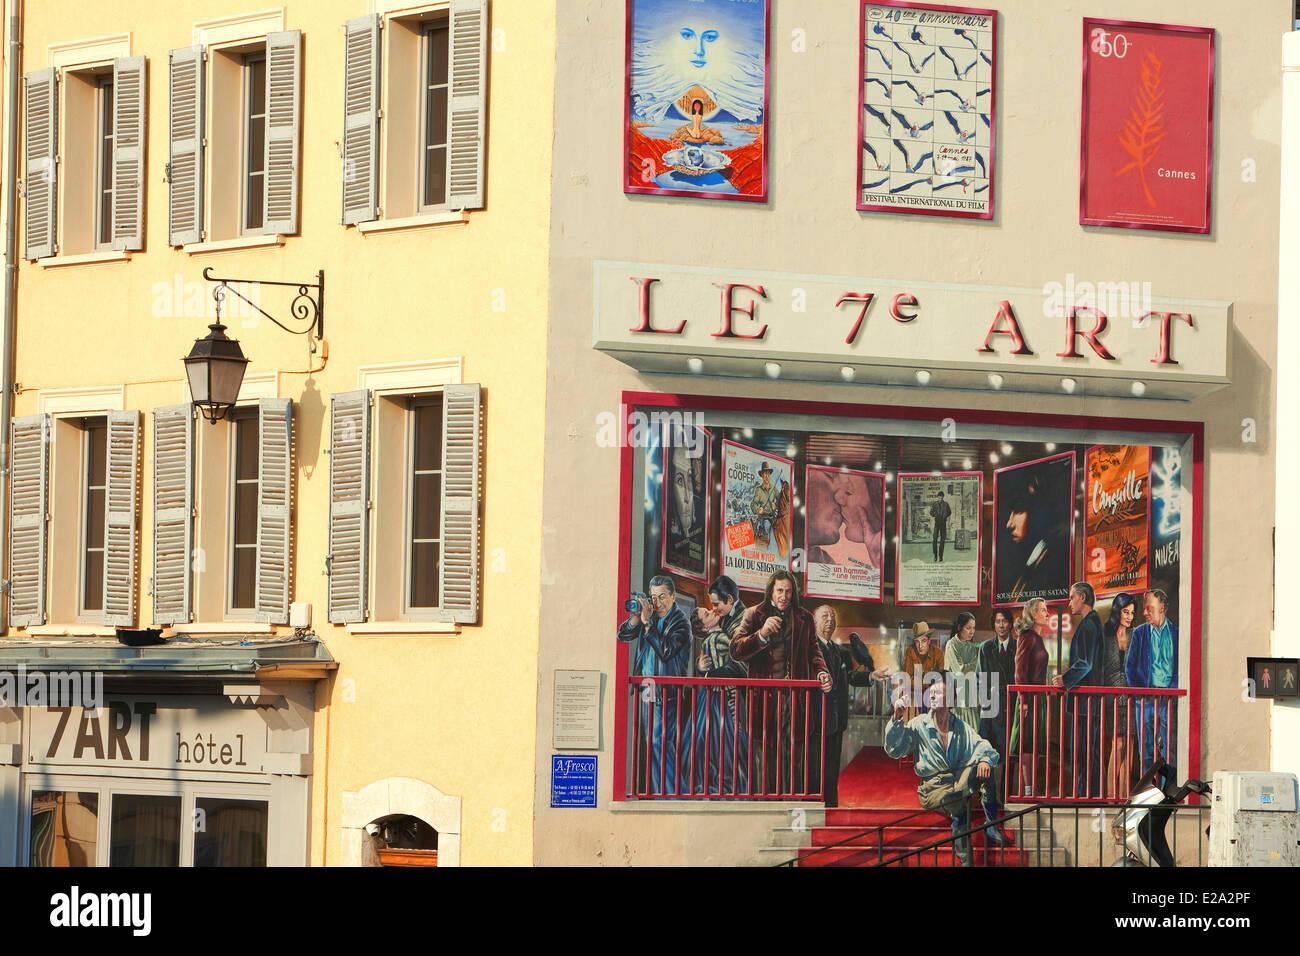 France, Alpes Maritimes, Cannes, Place du 18 juin, mural of the ...